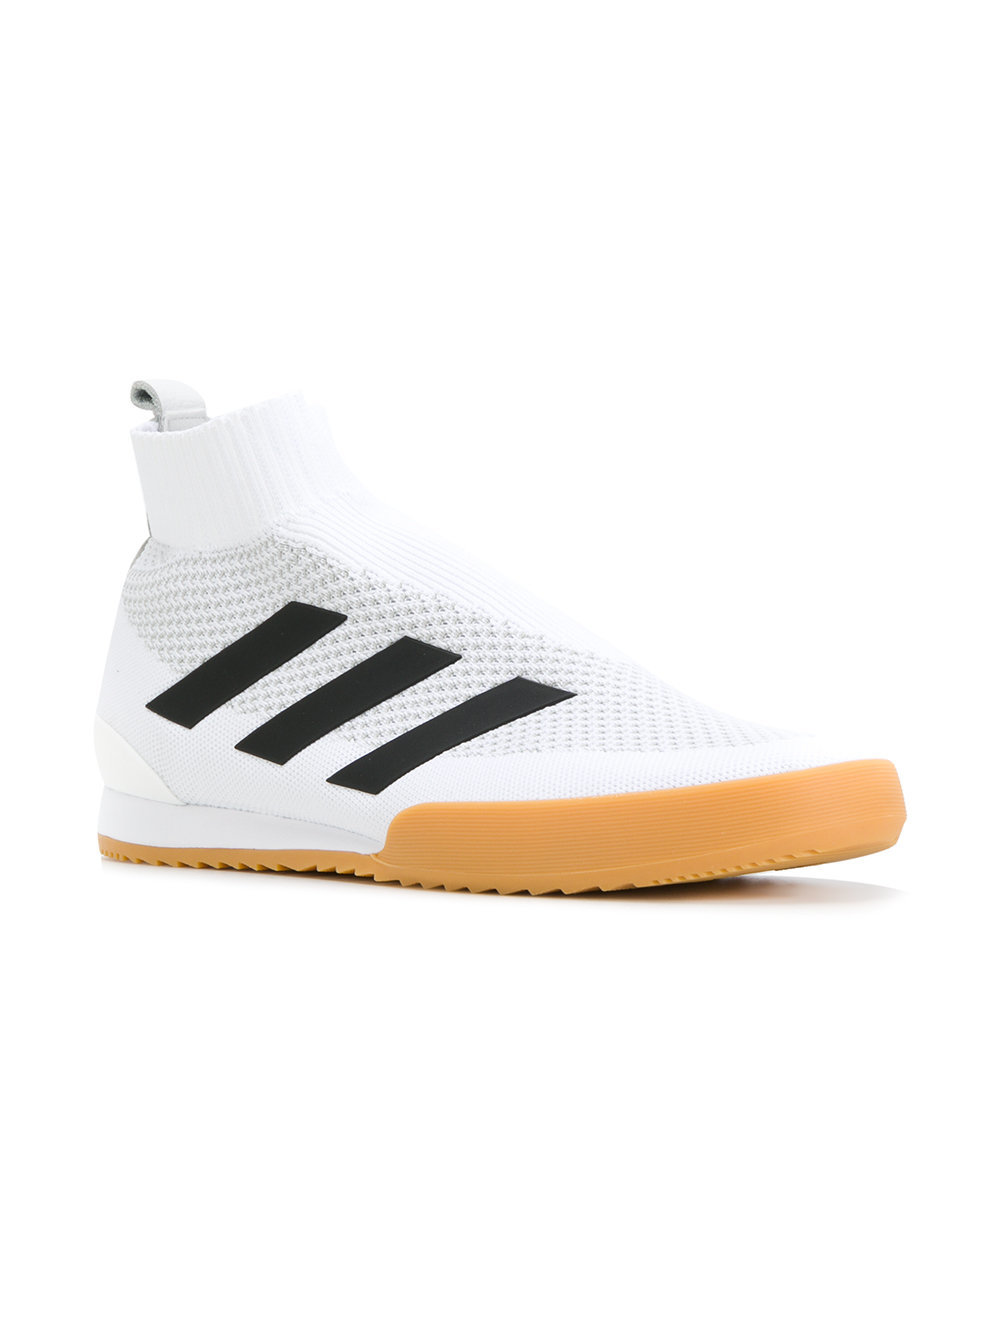 timeless design 62675 66cf3 £228, adidas Gosha Rubchinskiy X Sneakers